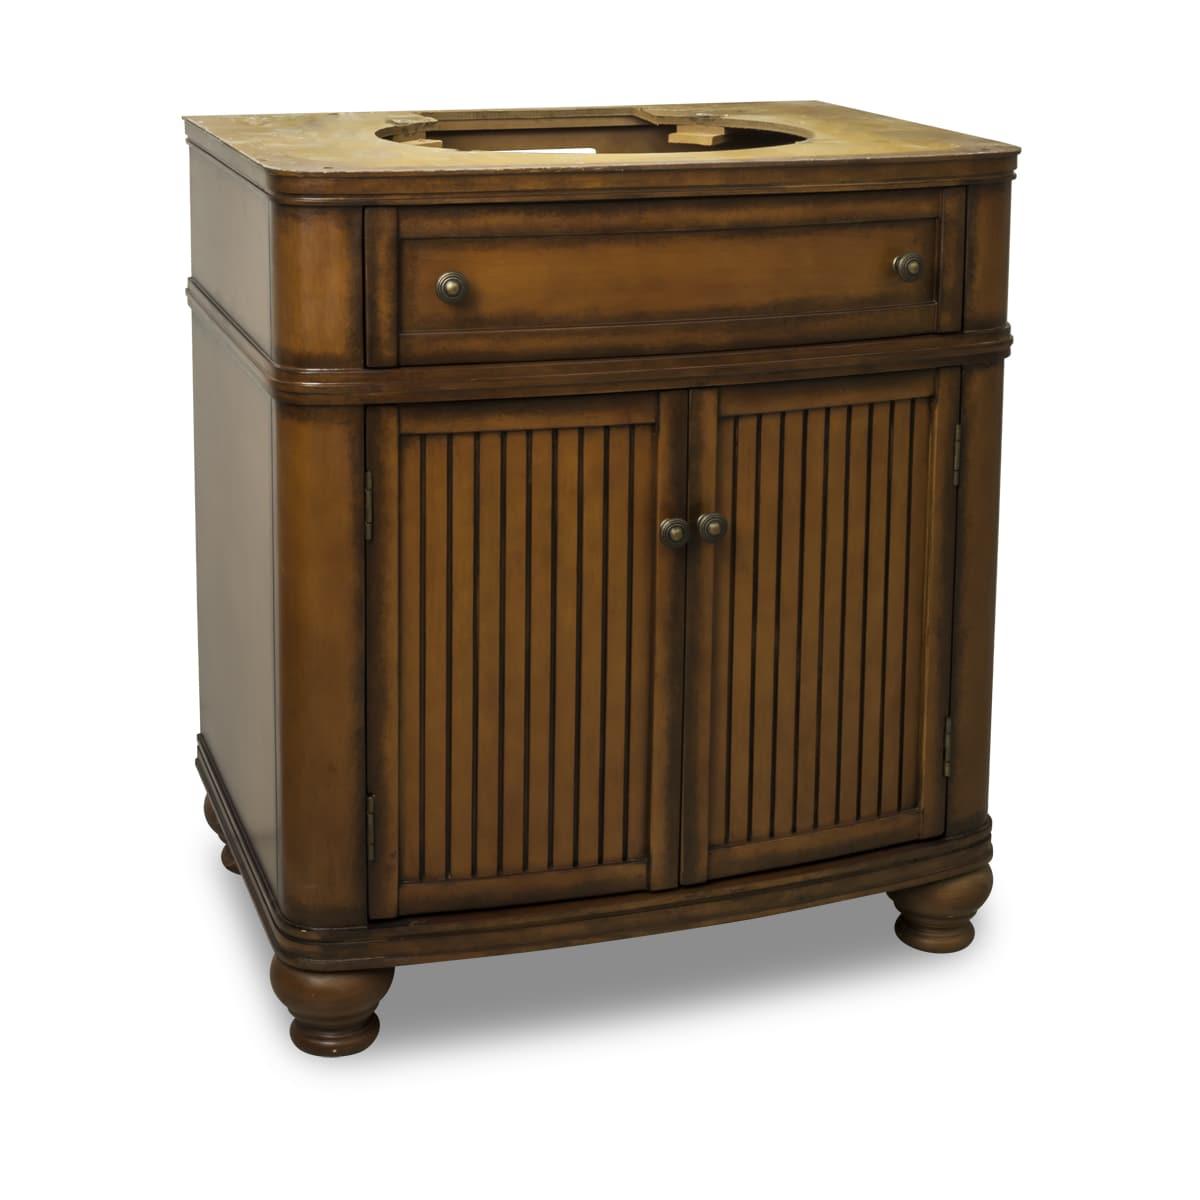 Elements Van029 Nt Painted Walnut, 30 Inch Bathroom Vanity Cabinet Only